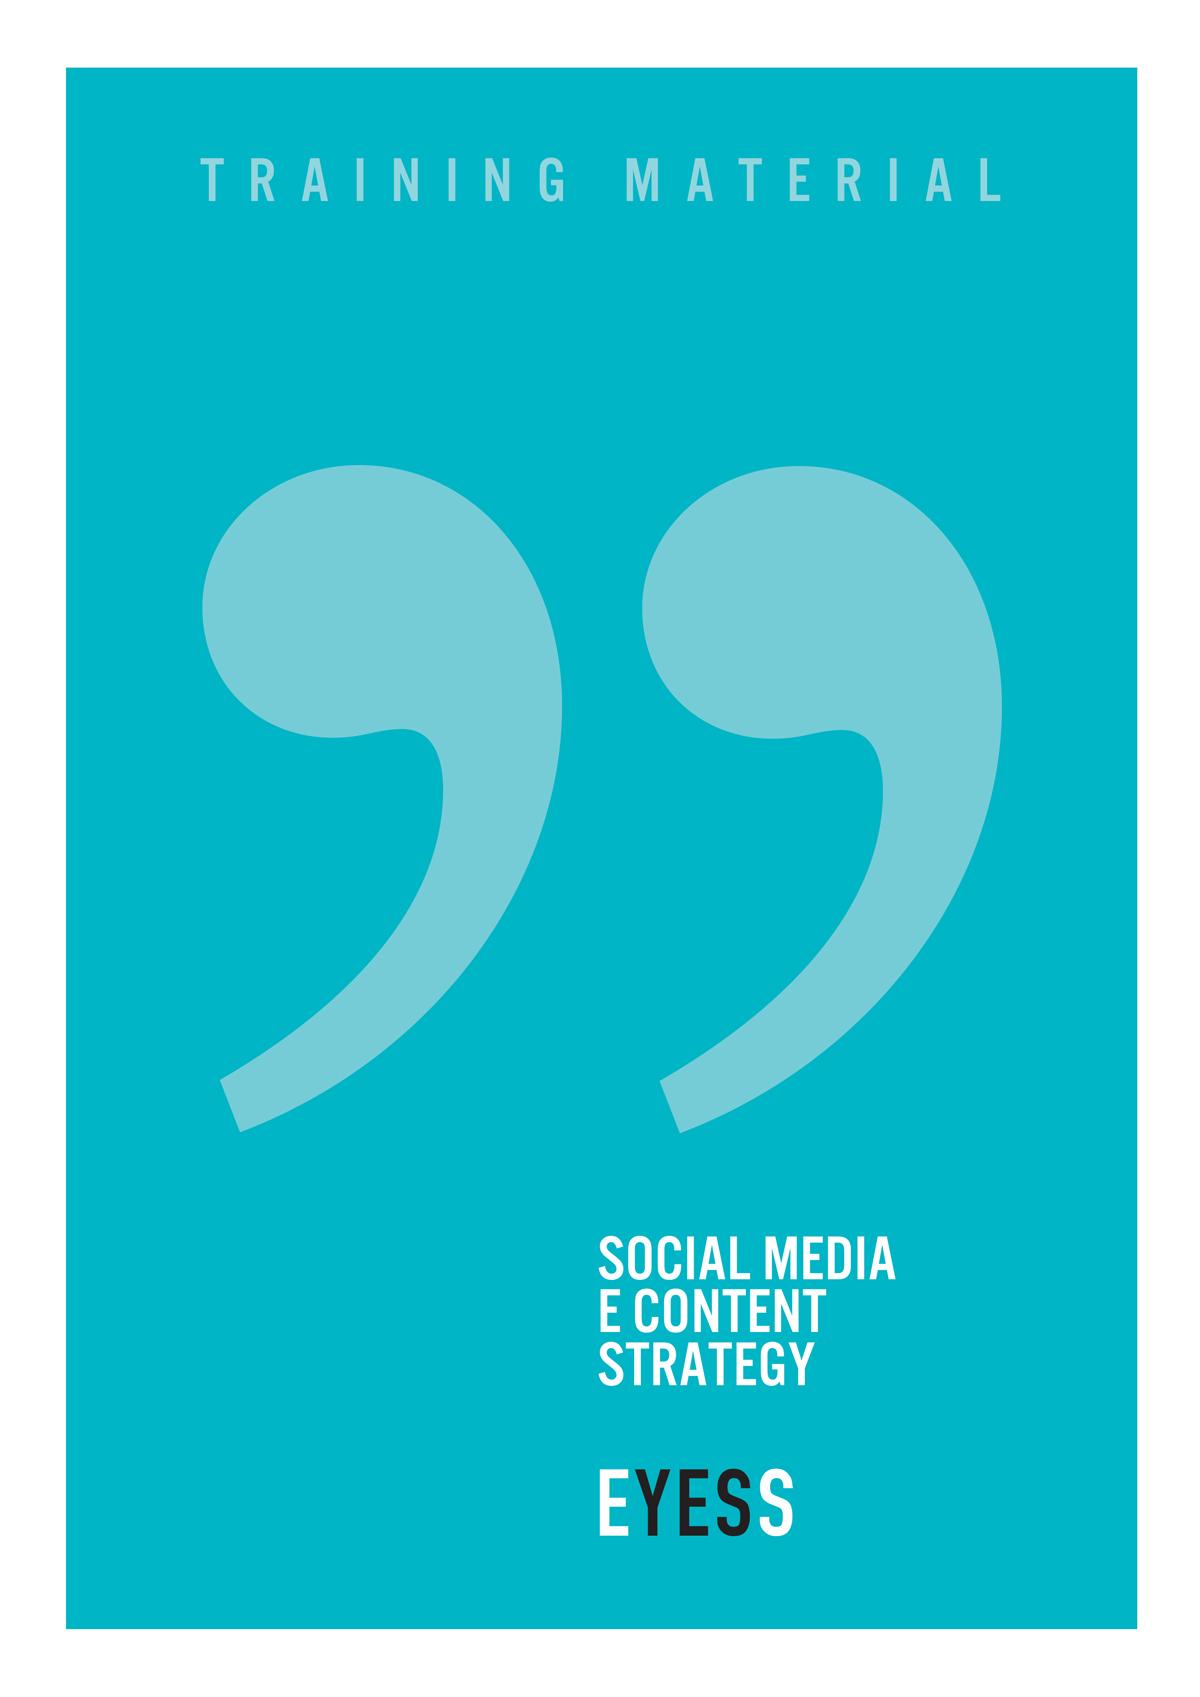 socialmediacontentstrategy